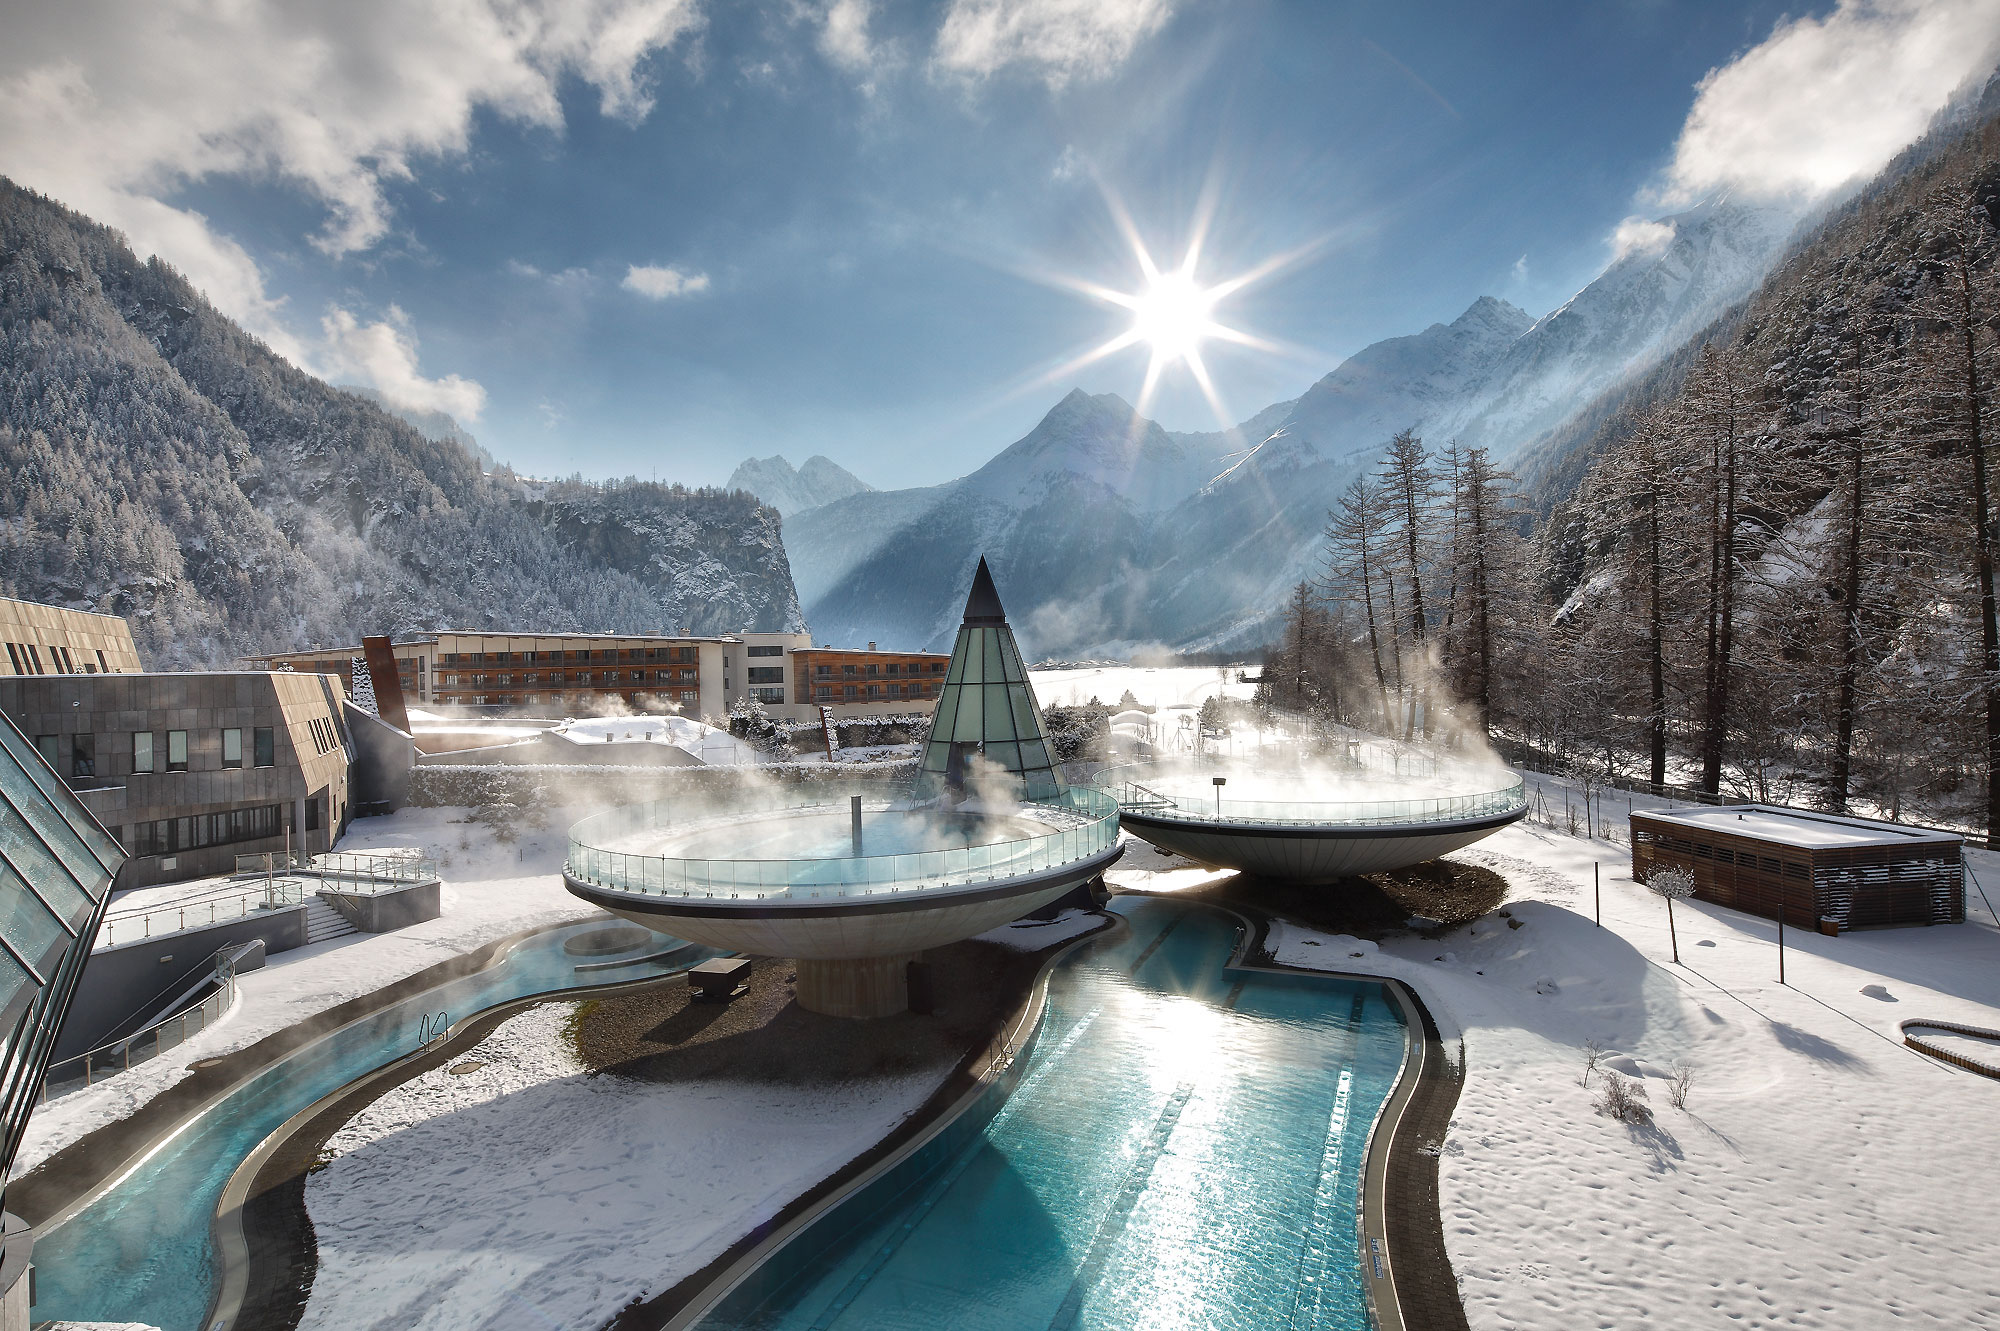 Aqua Dome Austria nude experience